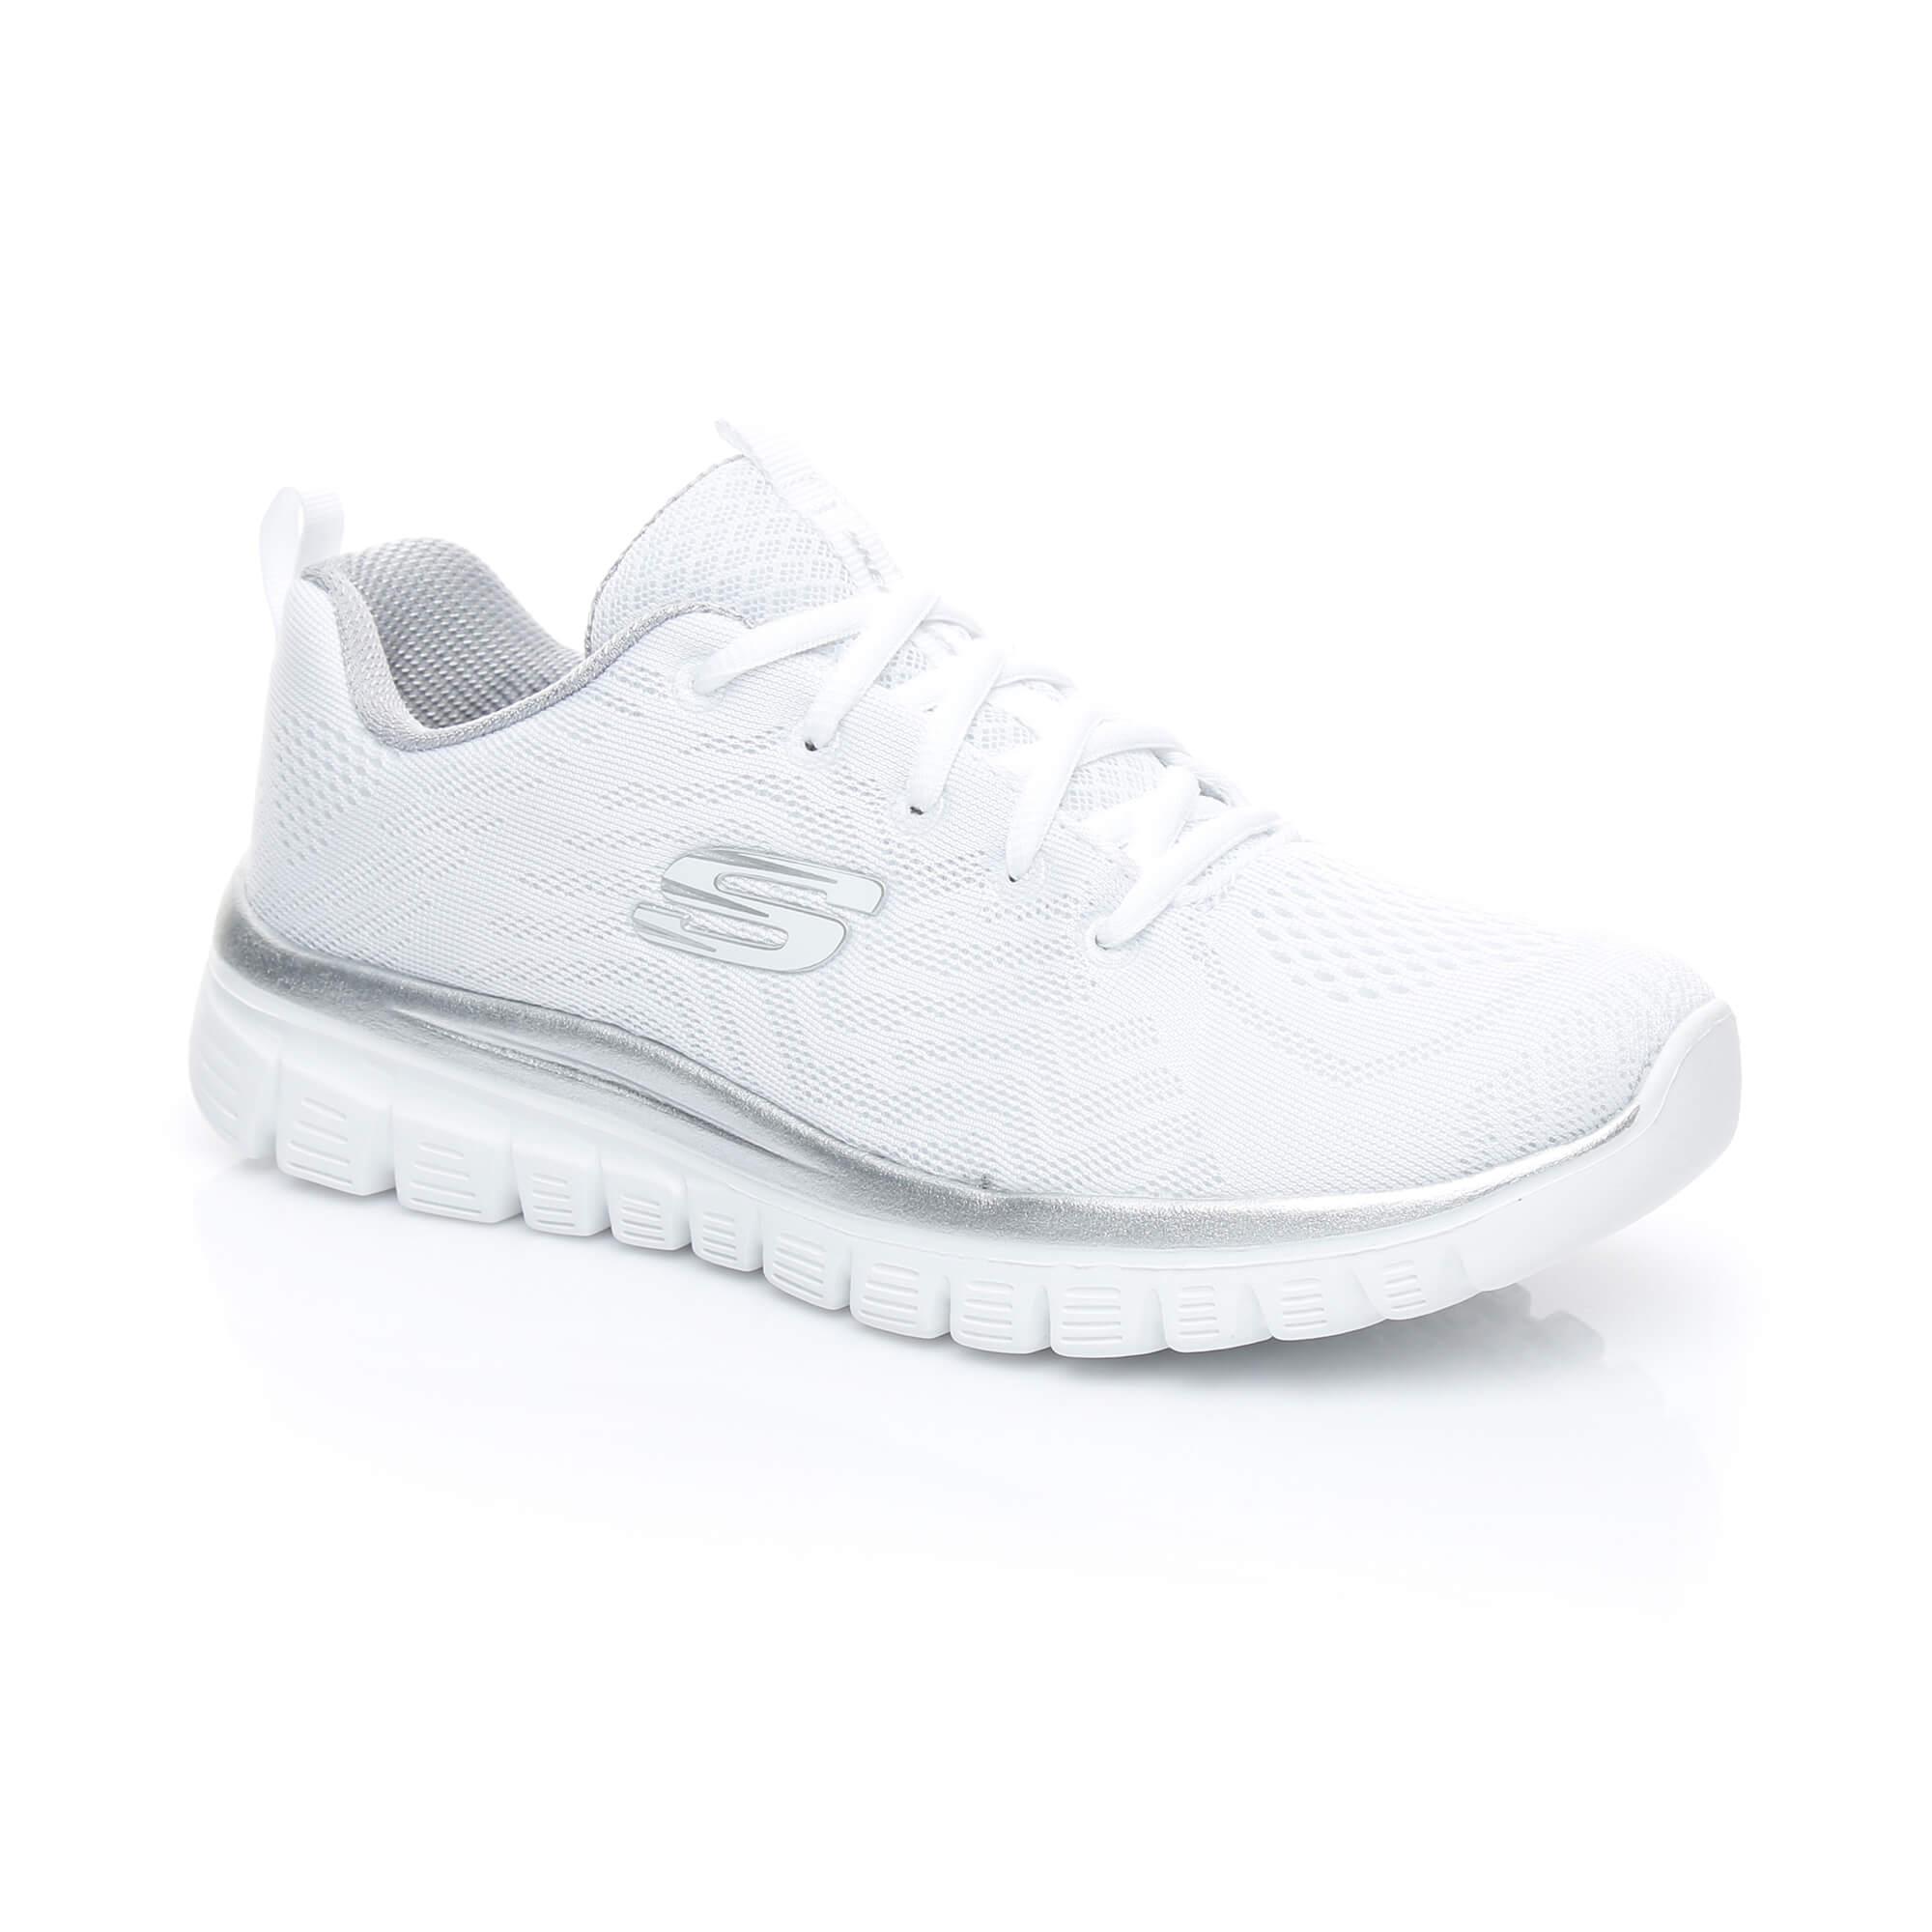 Skechers Graceful-Get Connected Kadın Beyaz Sneaker